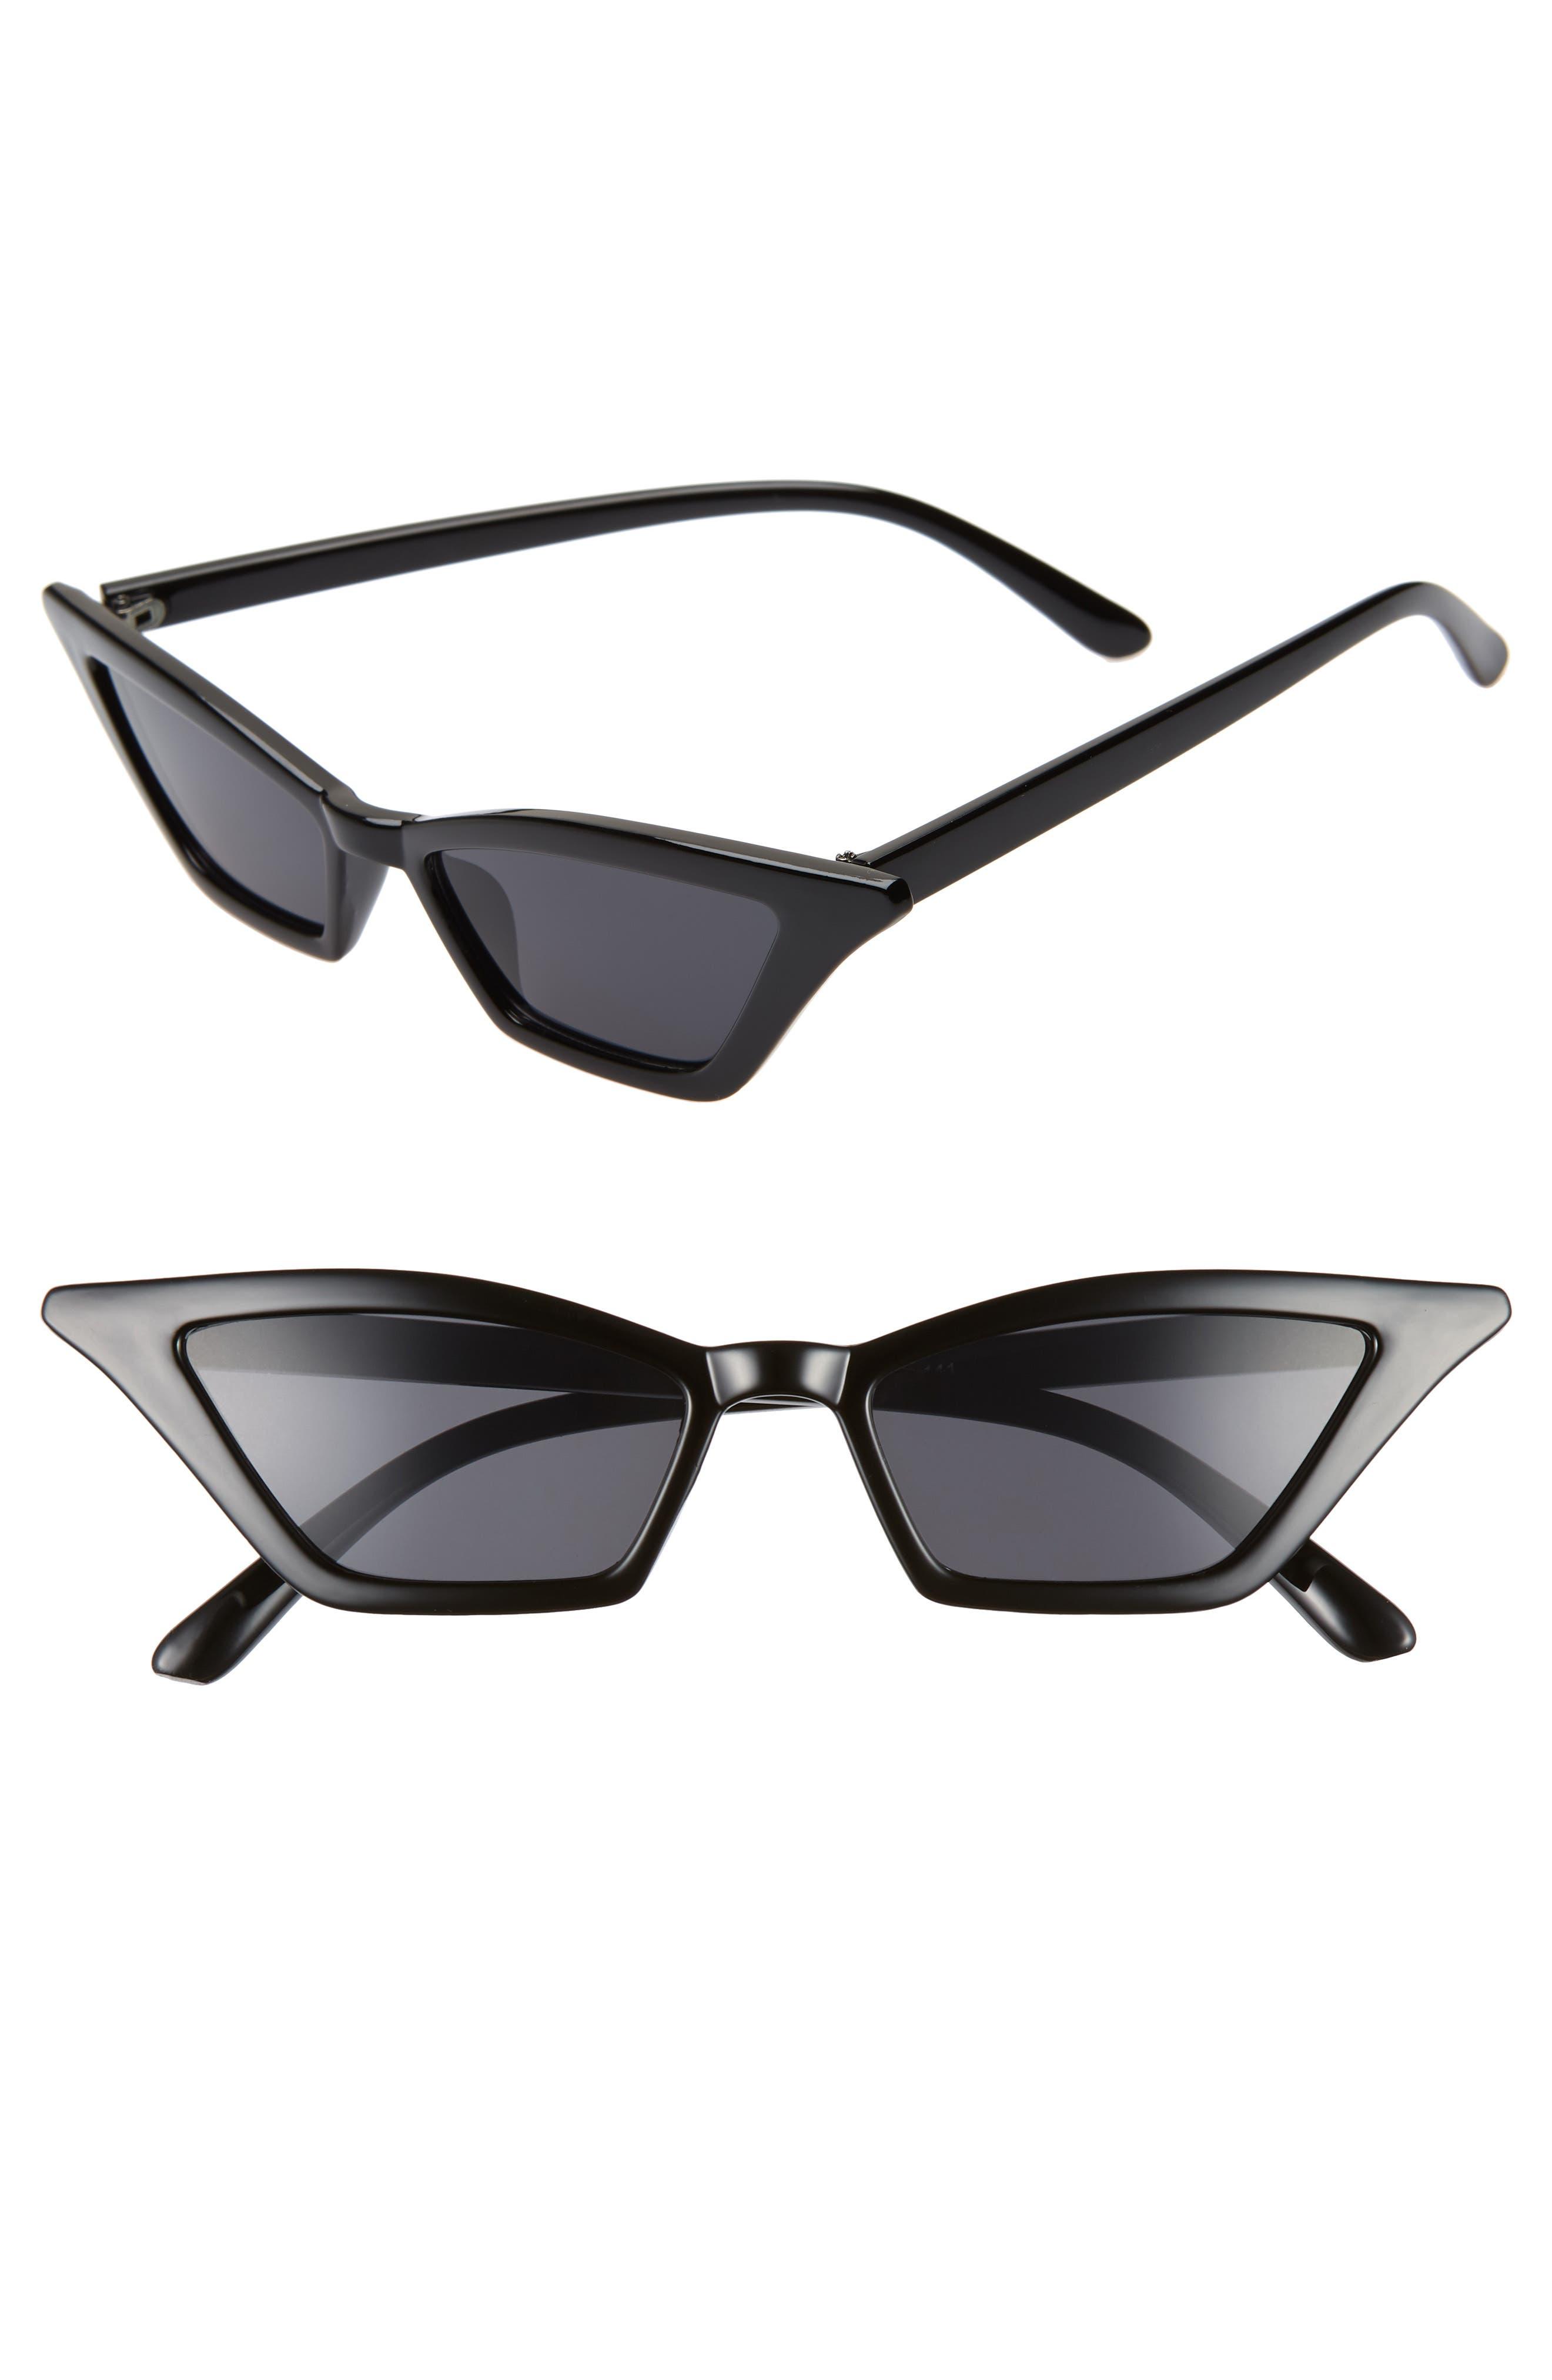 54mm Geometric Sunglasses,                         Main,                         color, BLACK/ BLACK